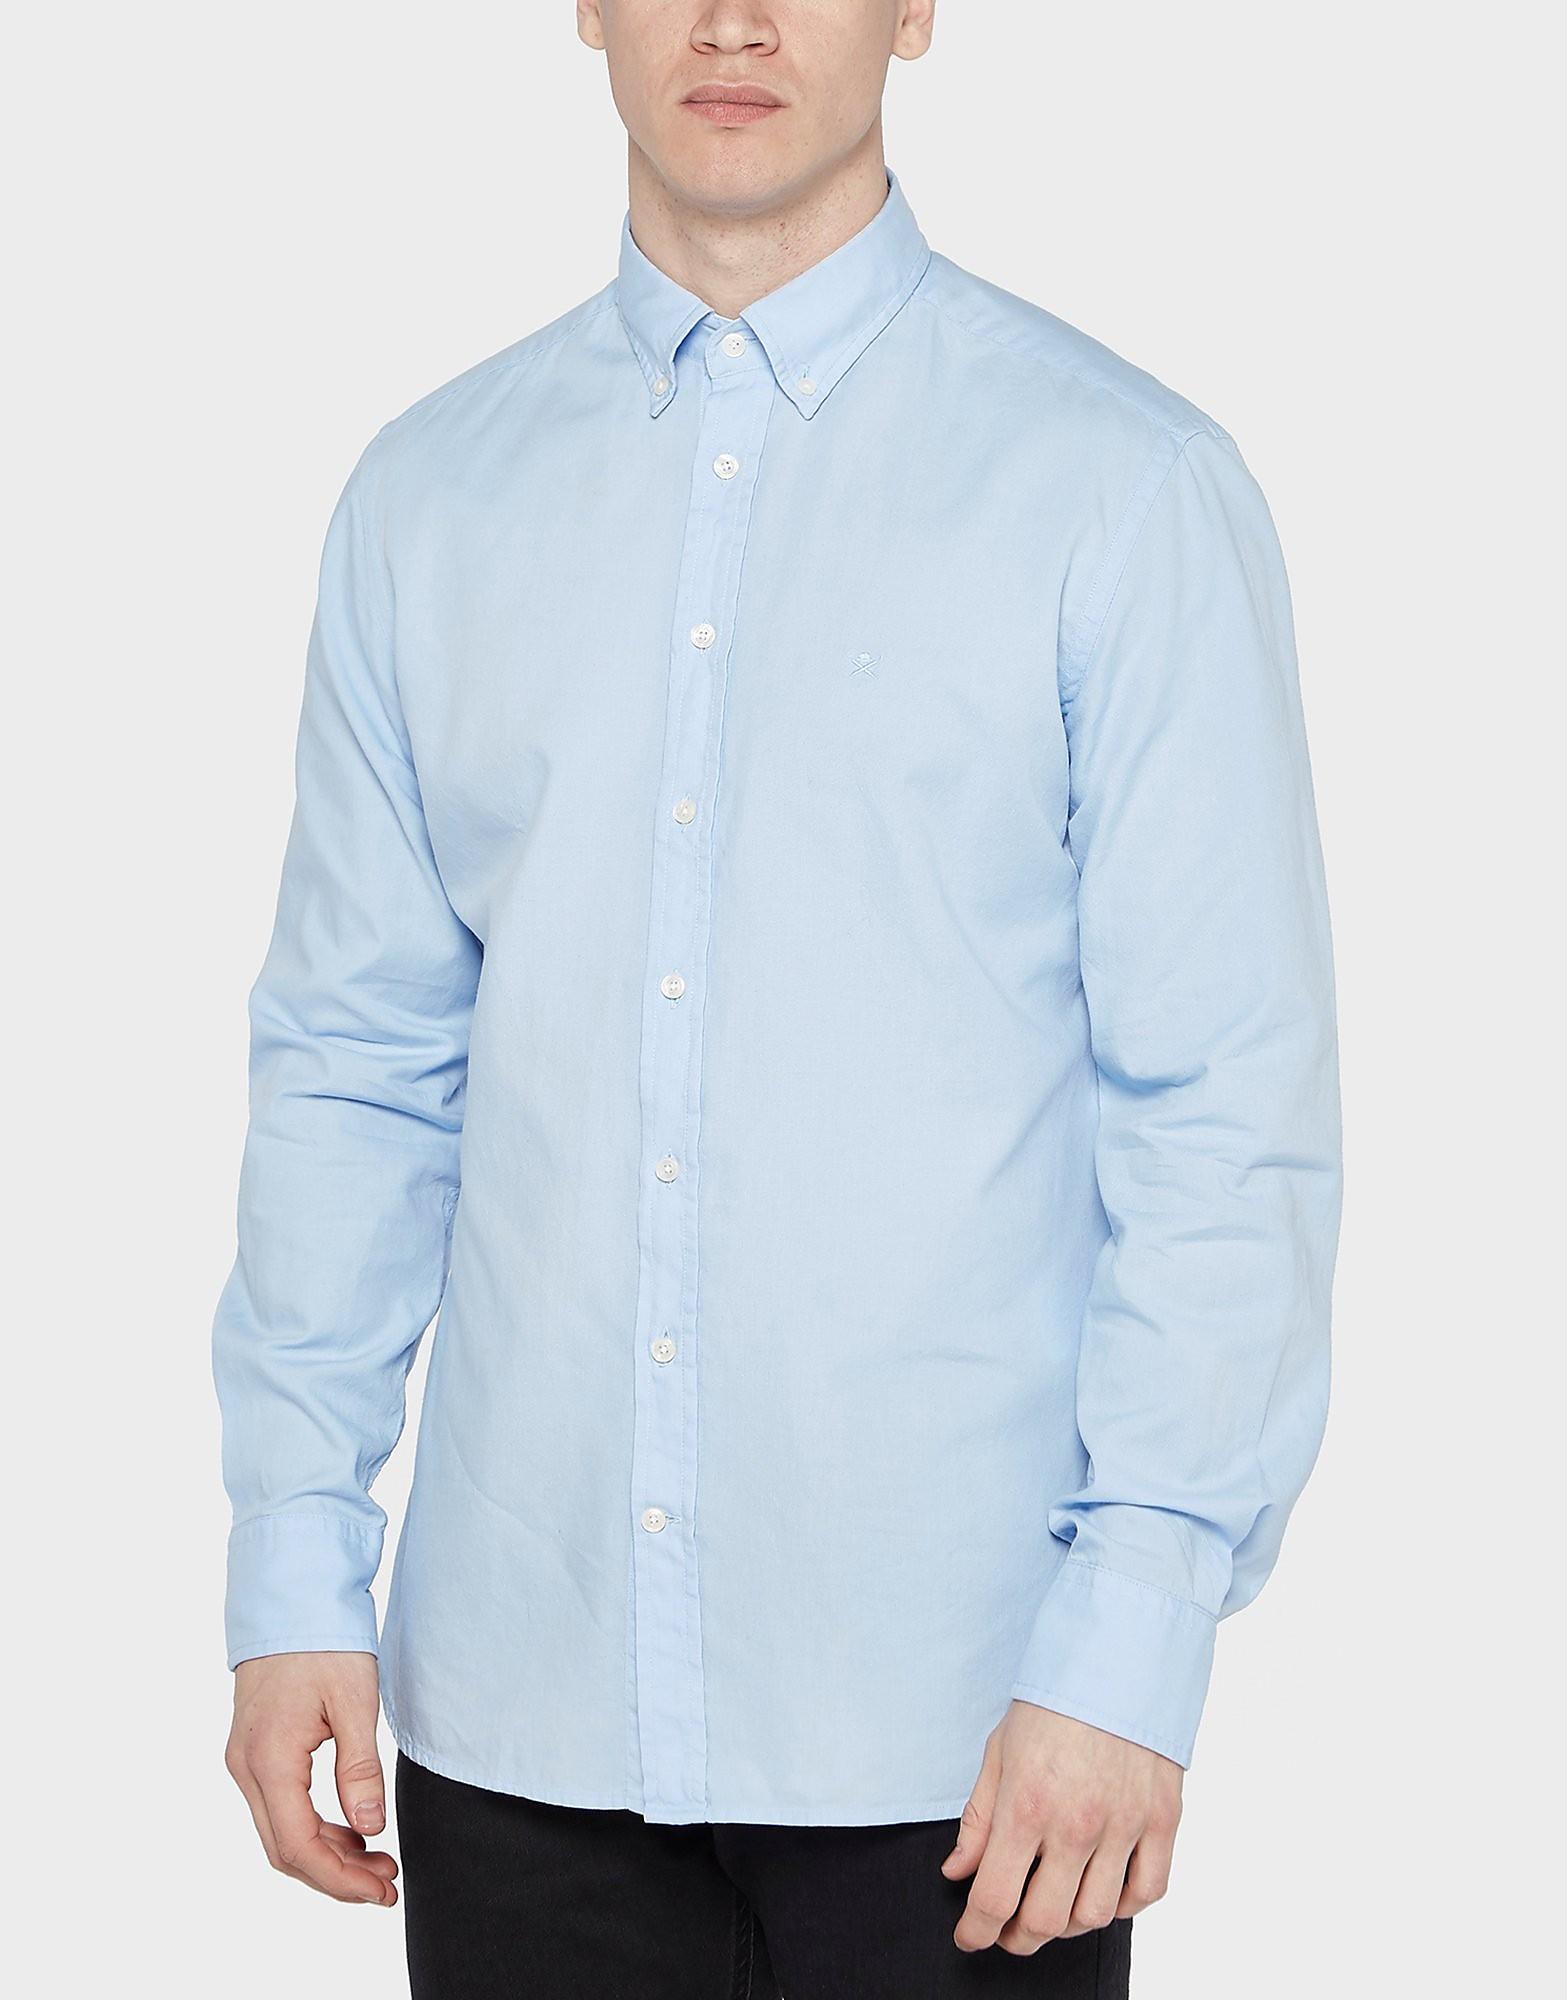 HACKETT Long Sleeve Oxford Shirt